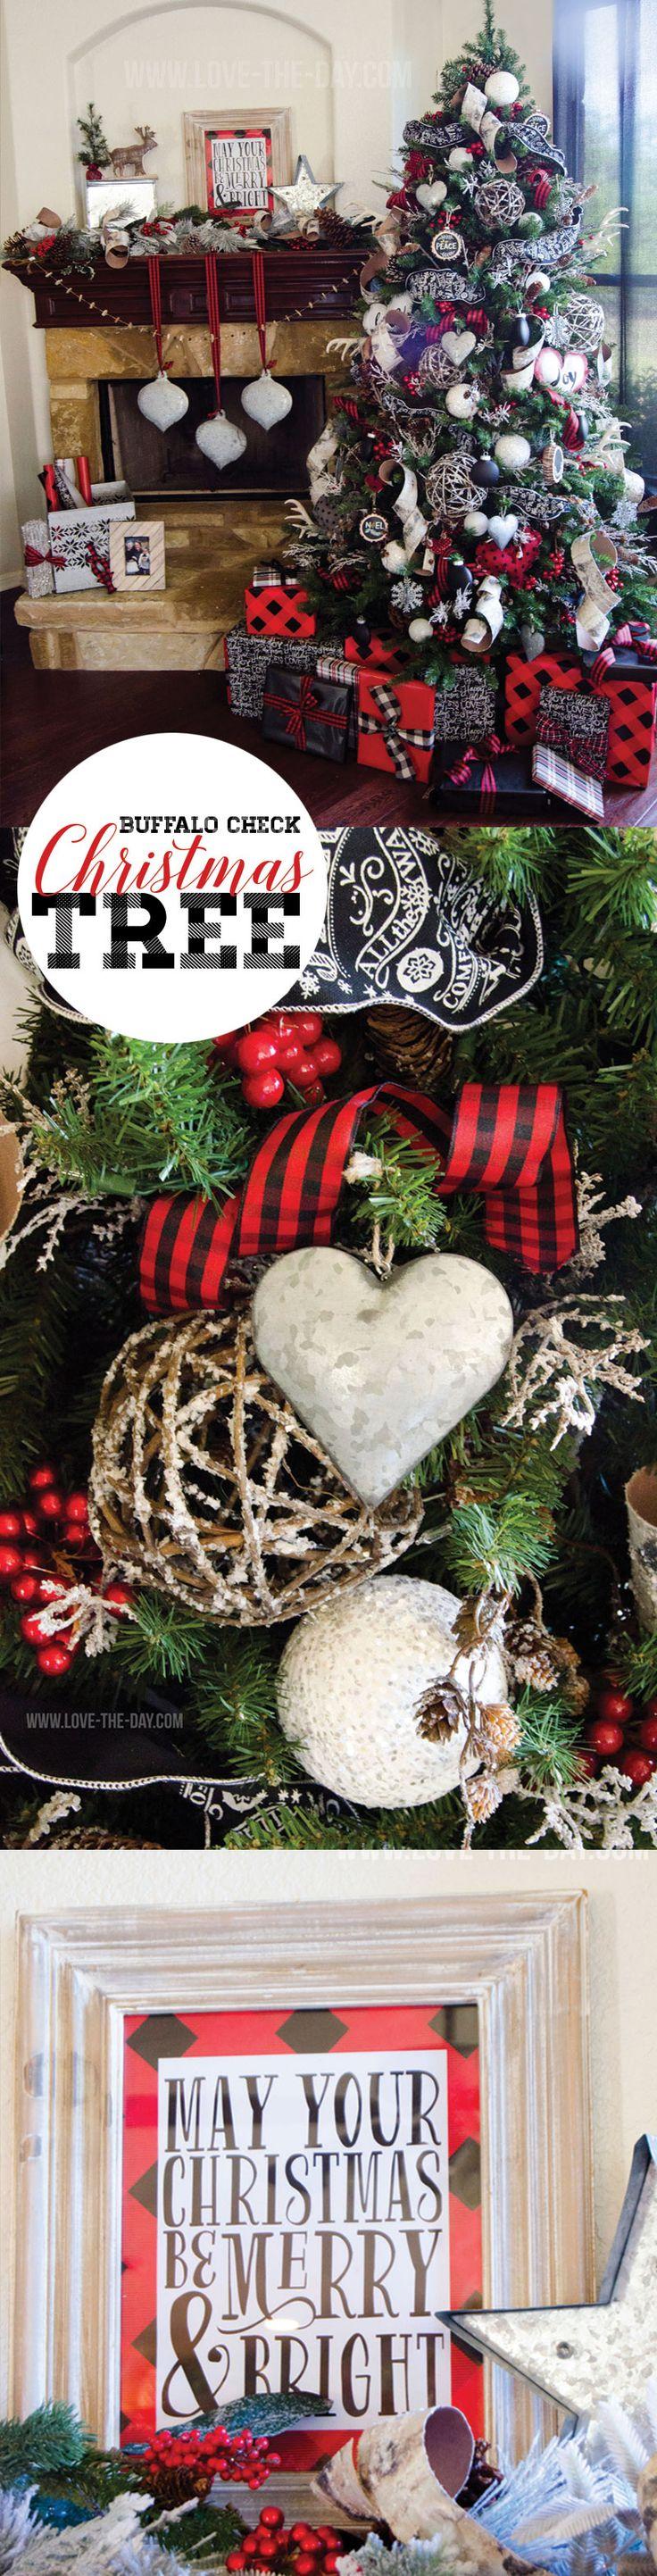 Mrs potts chip christmas decoration - Buffalo Check Christmas Tree By Lindi Haws Of Love The Day